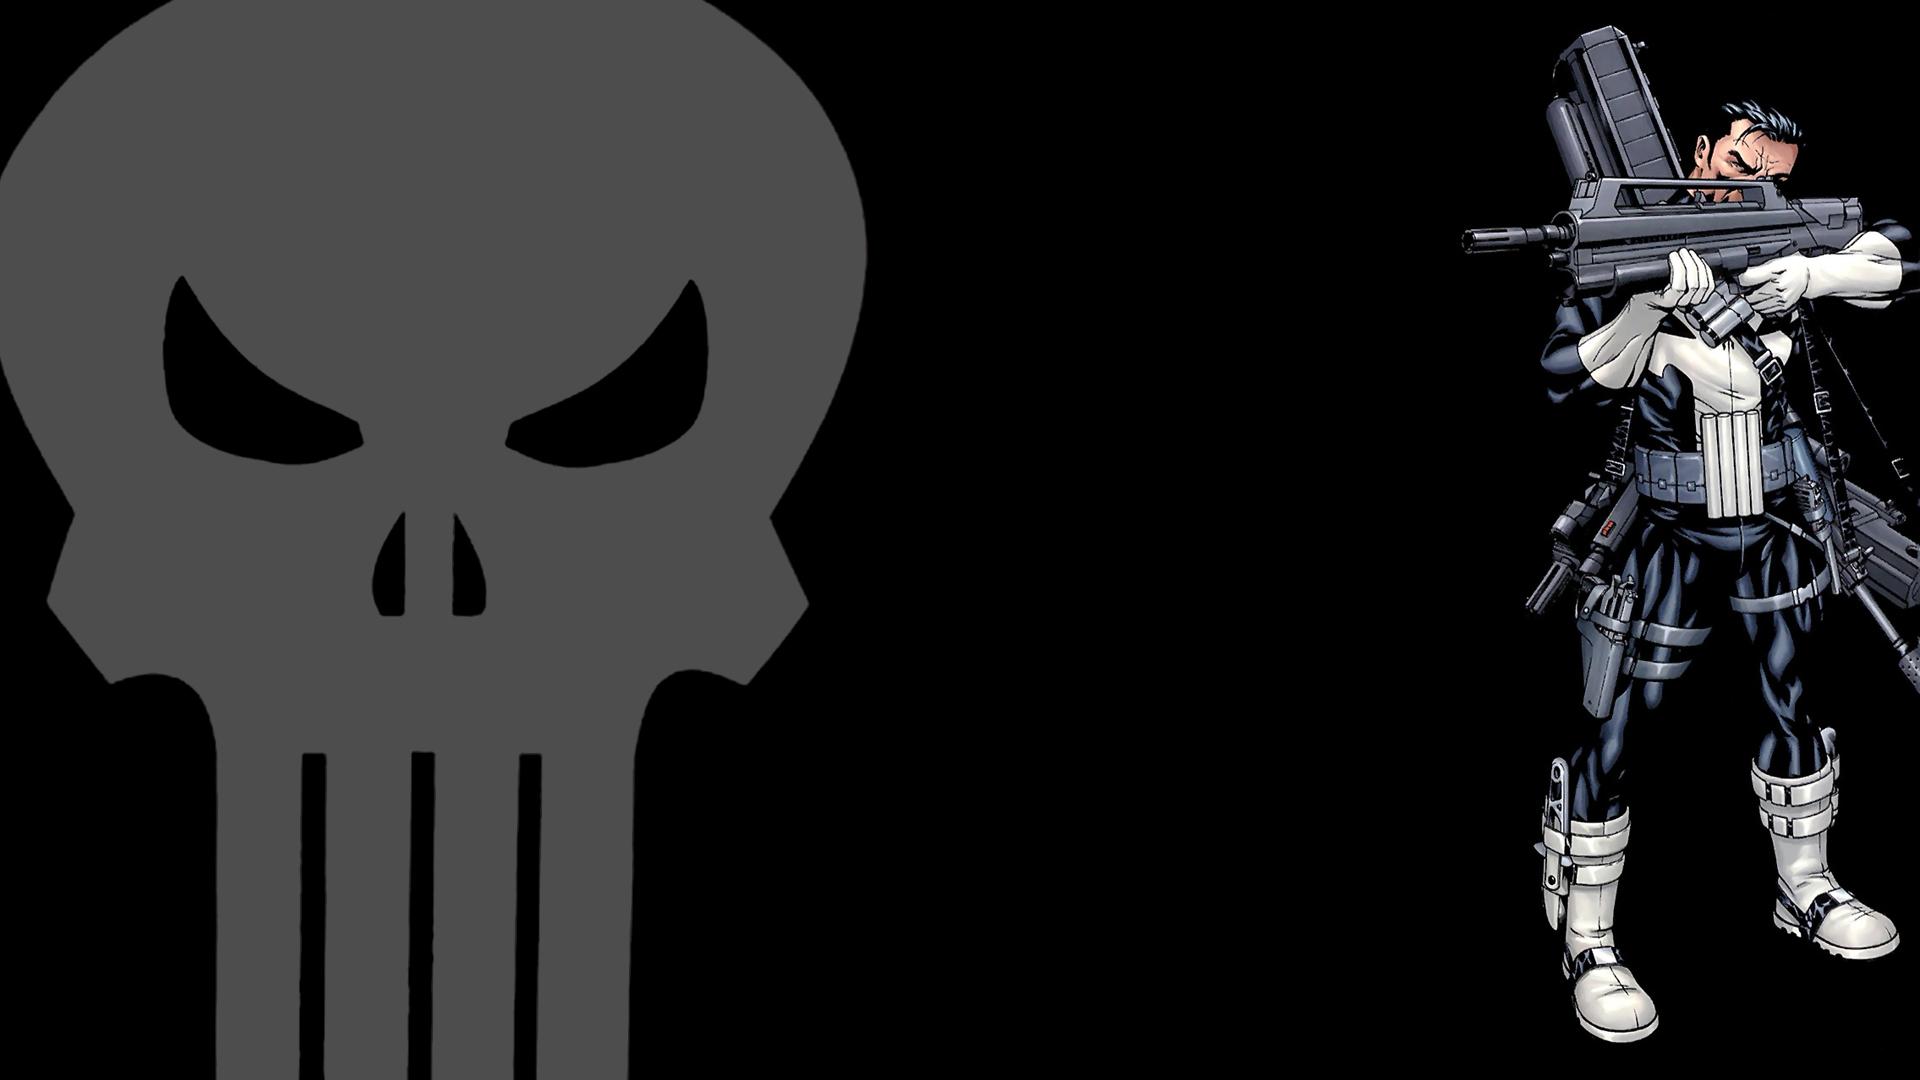 The Punisher Wallpaper 1920x1080 The, Punisher, Marvel, Comics